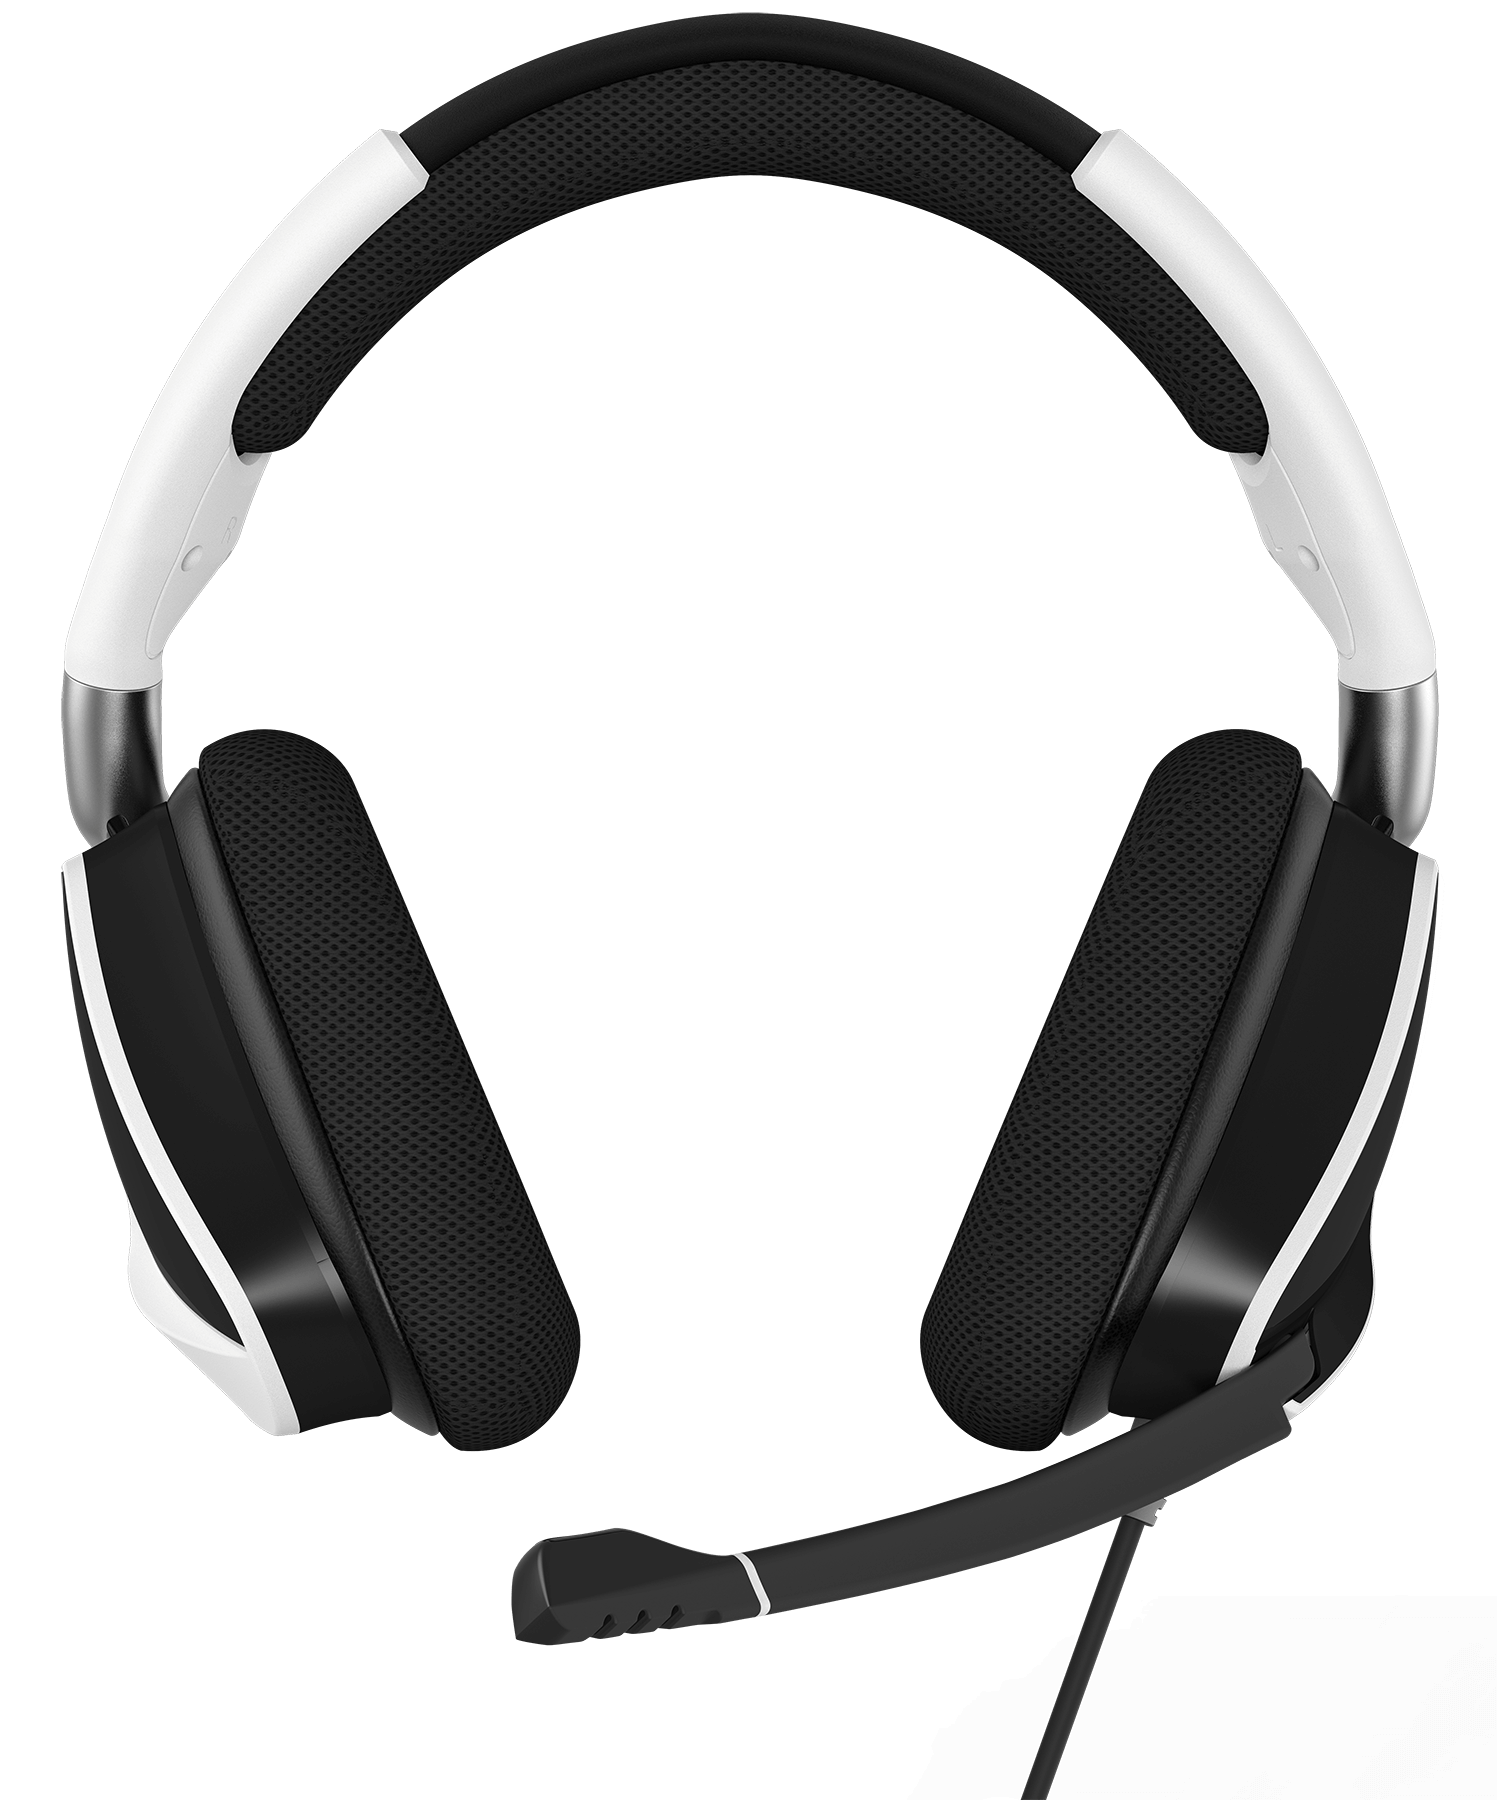 Casti Gaming Corsair Void PRO RGB USB Dolby 7.1 White